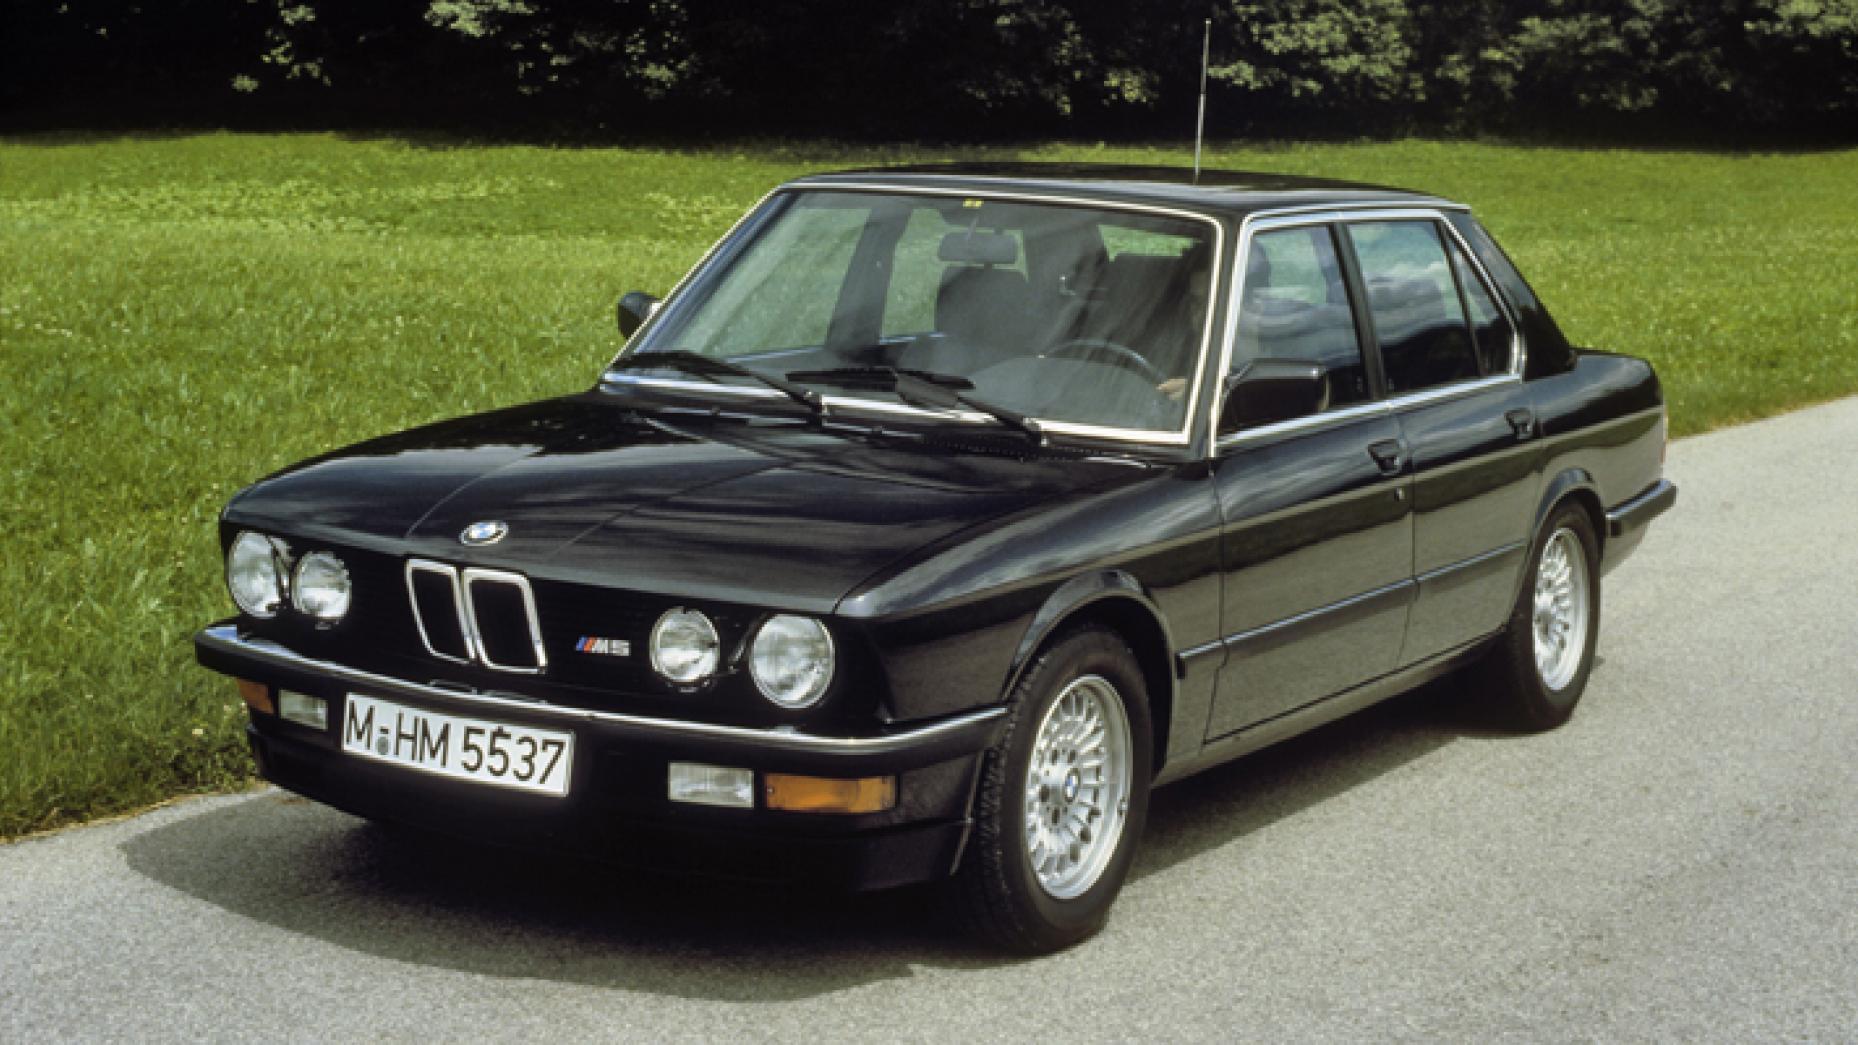 BMW M5 E28 berlina deportiva lujo